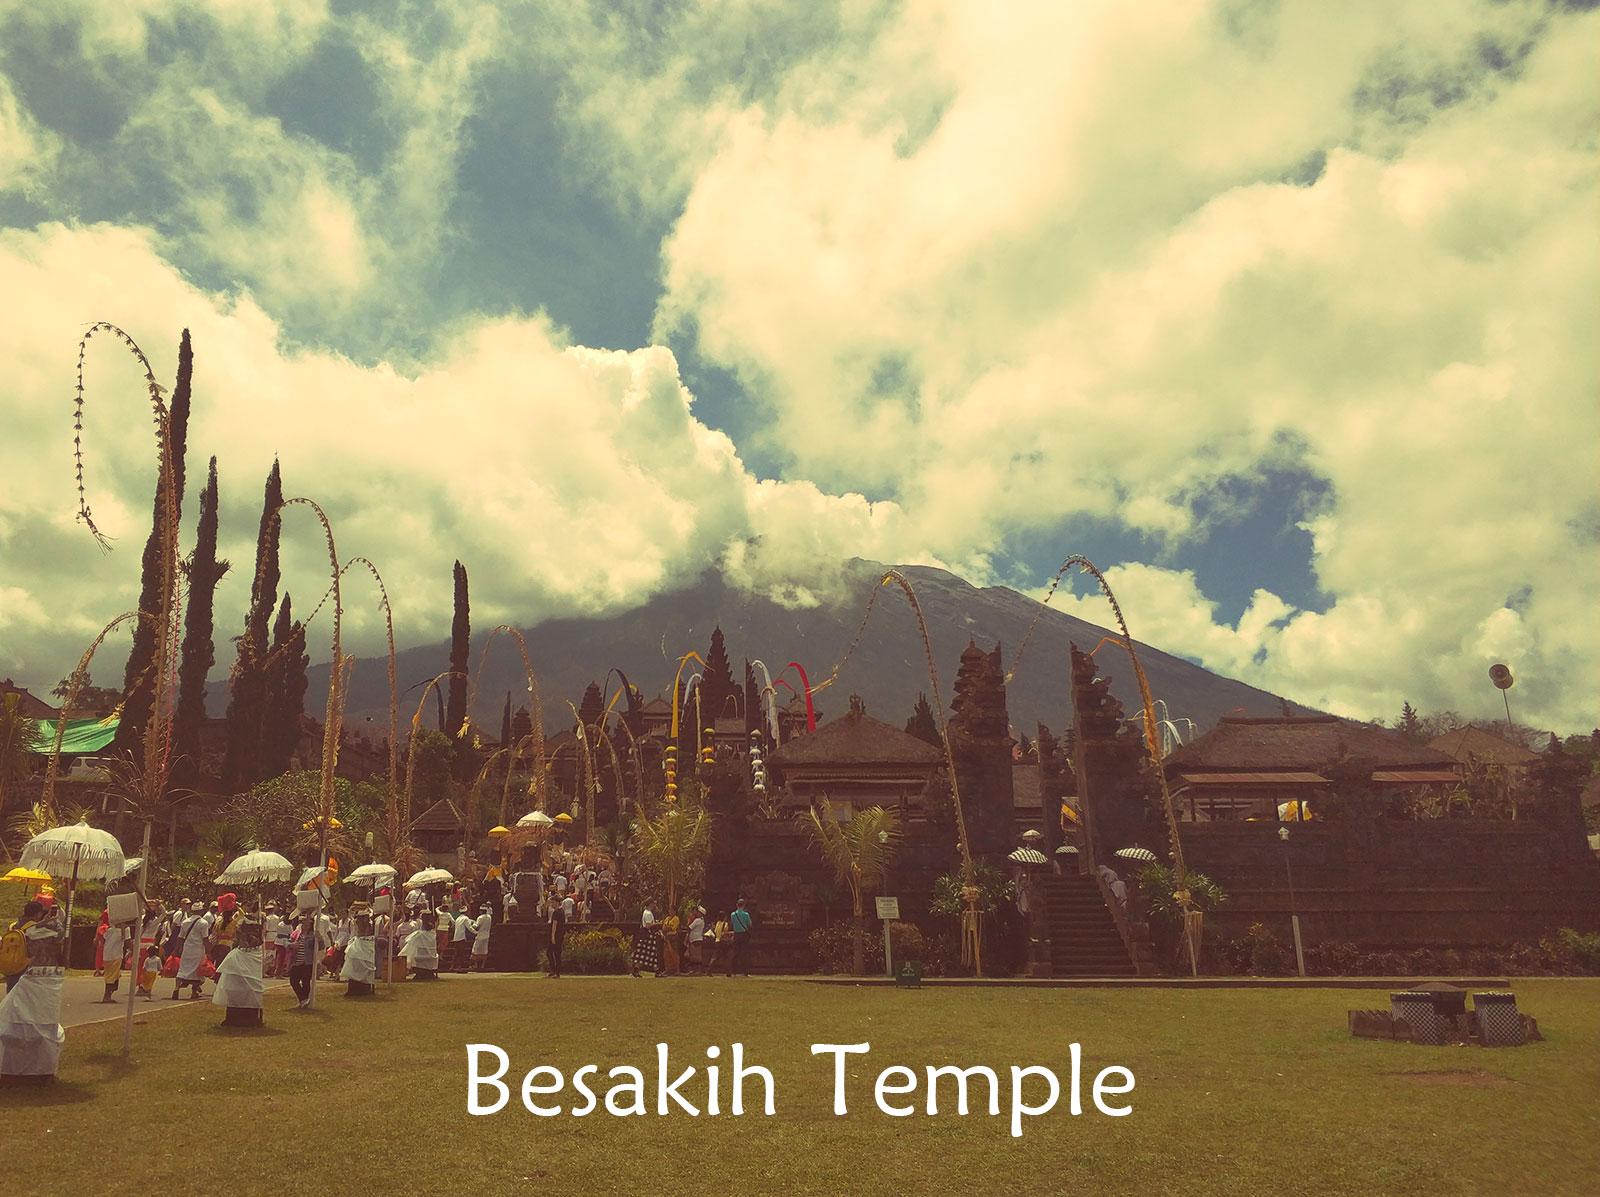 besakih-temple-main